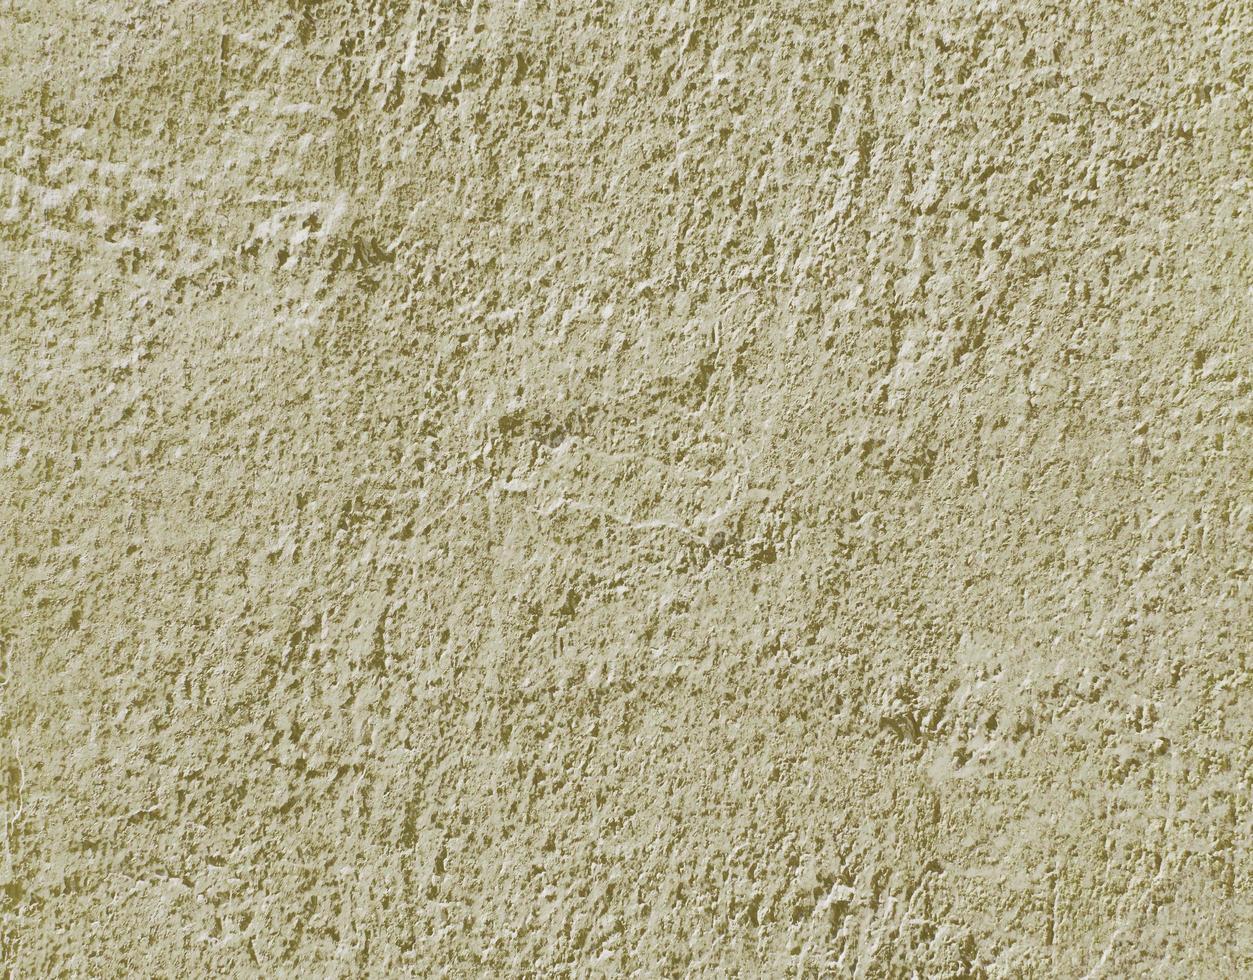 Concrete wall texture photo